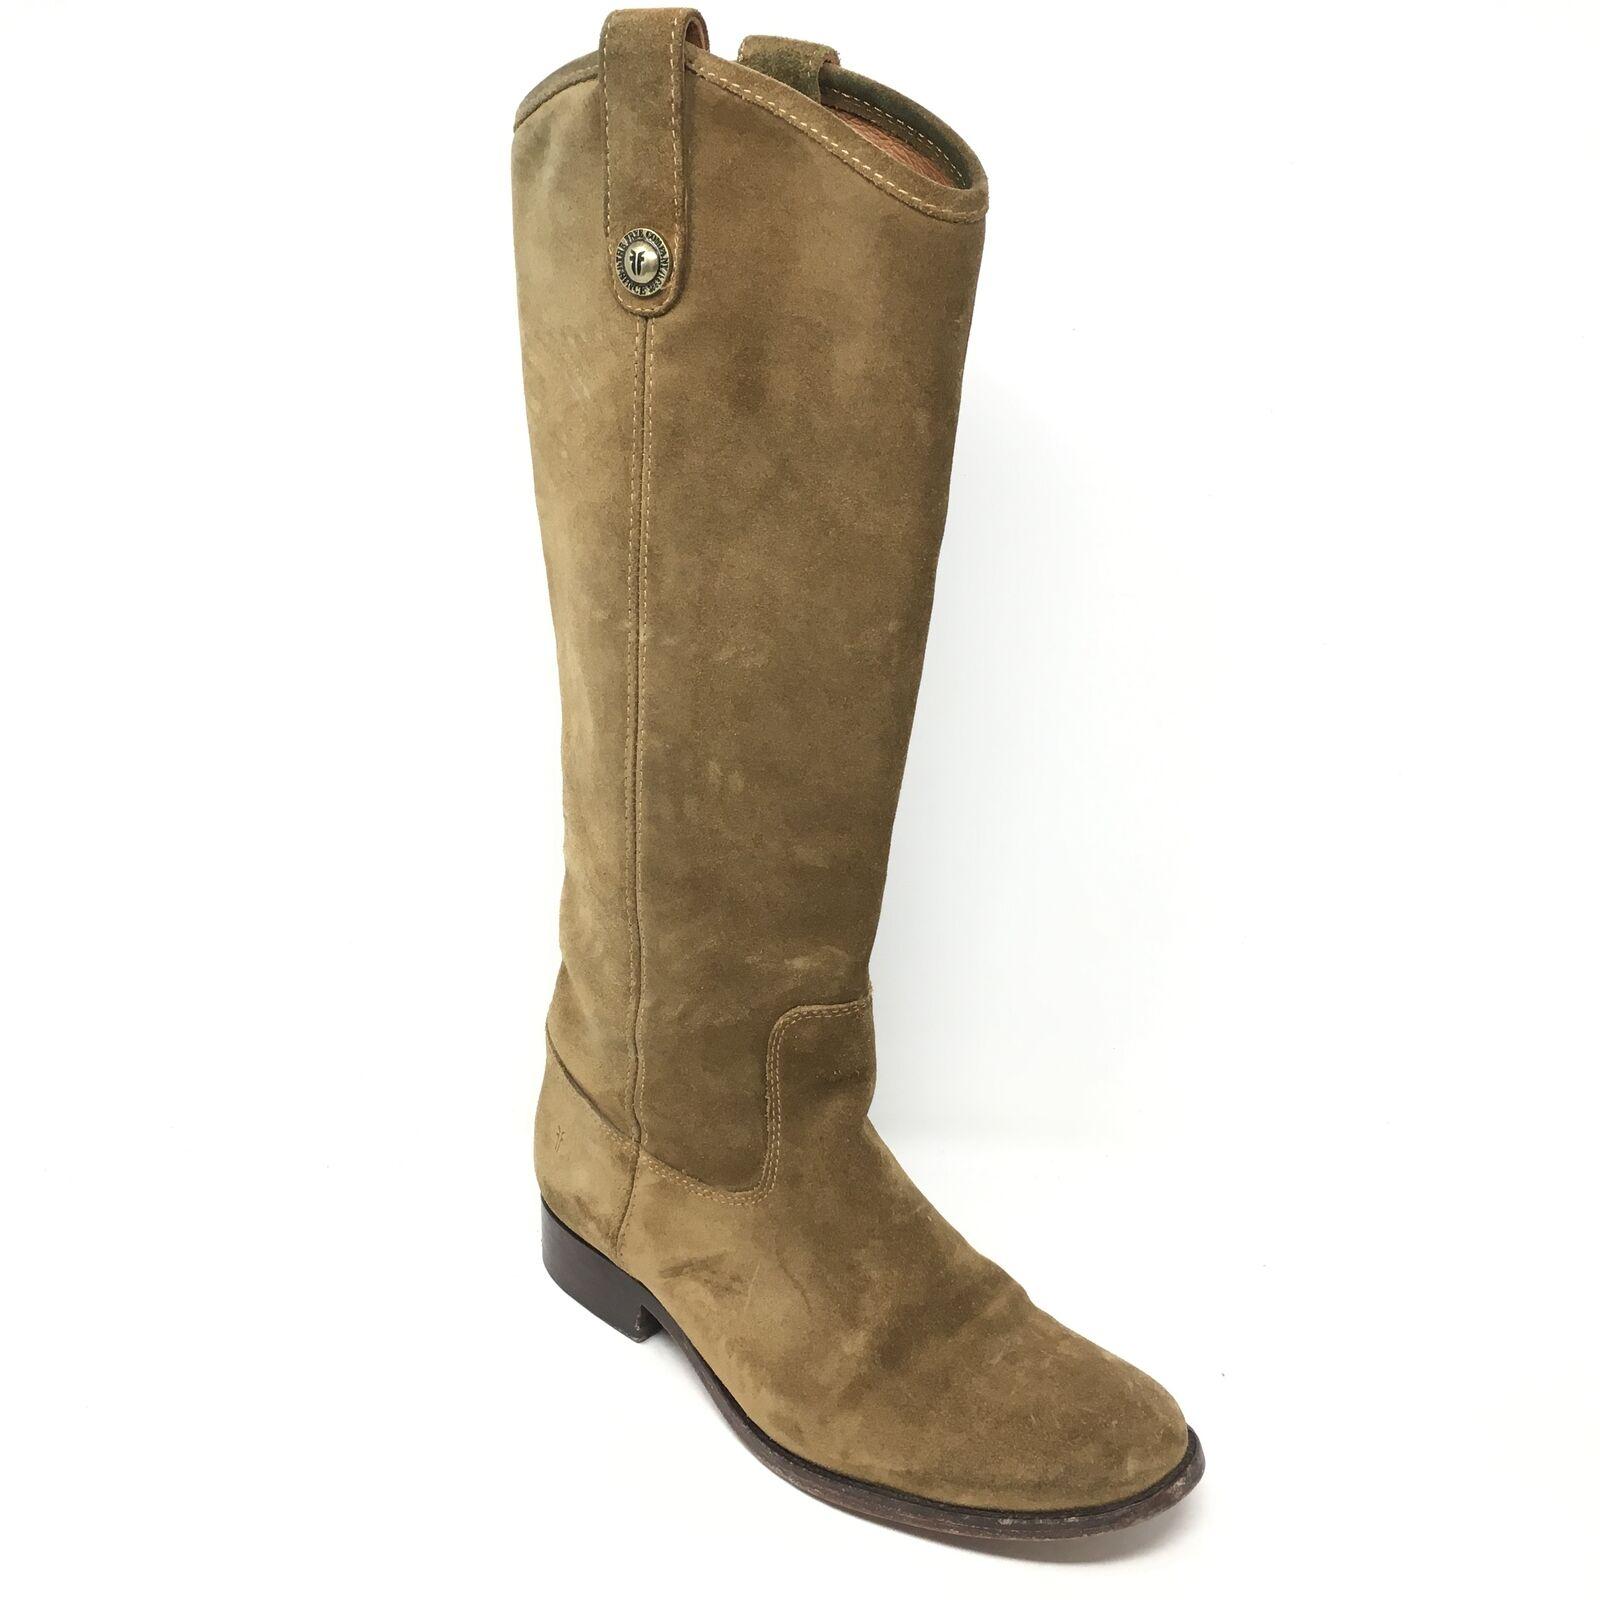 conveniente Donna  Frye Melissa Knee Knee Knee High stivali scarpe Dimensione 7B Marrone Pull On Western X14  vendita online